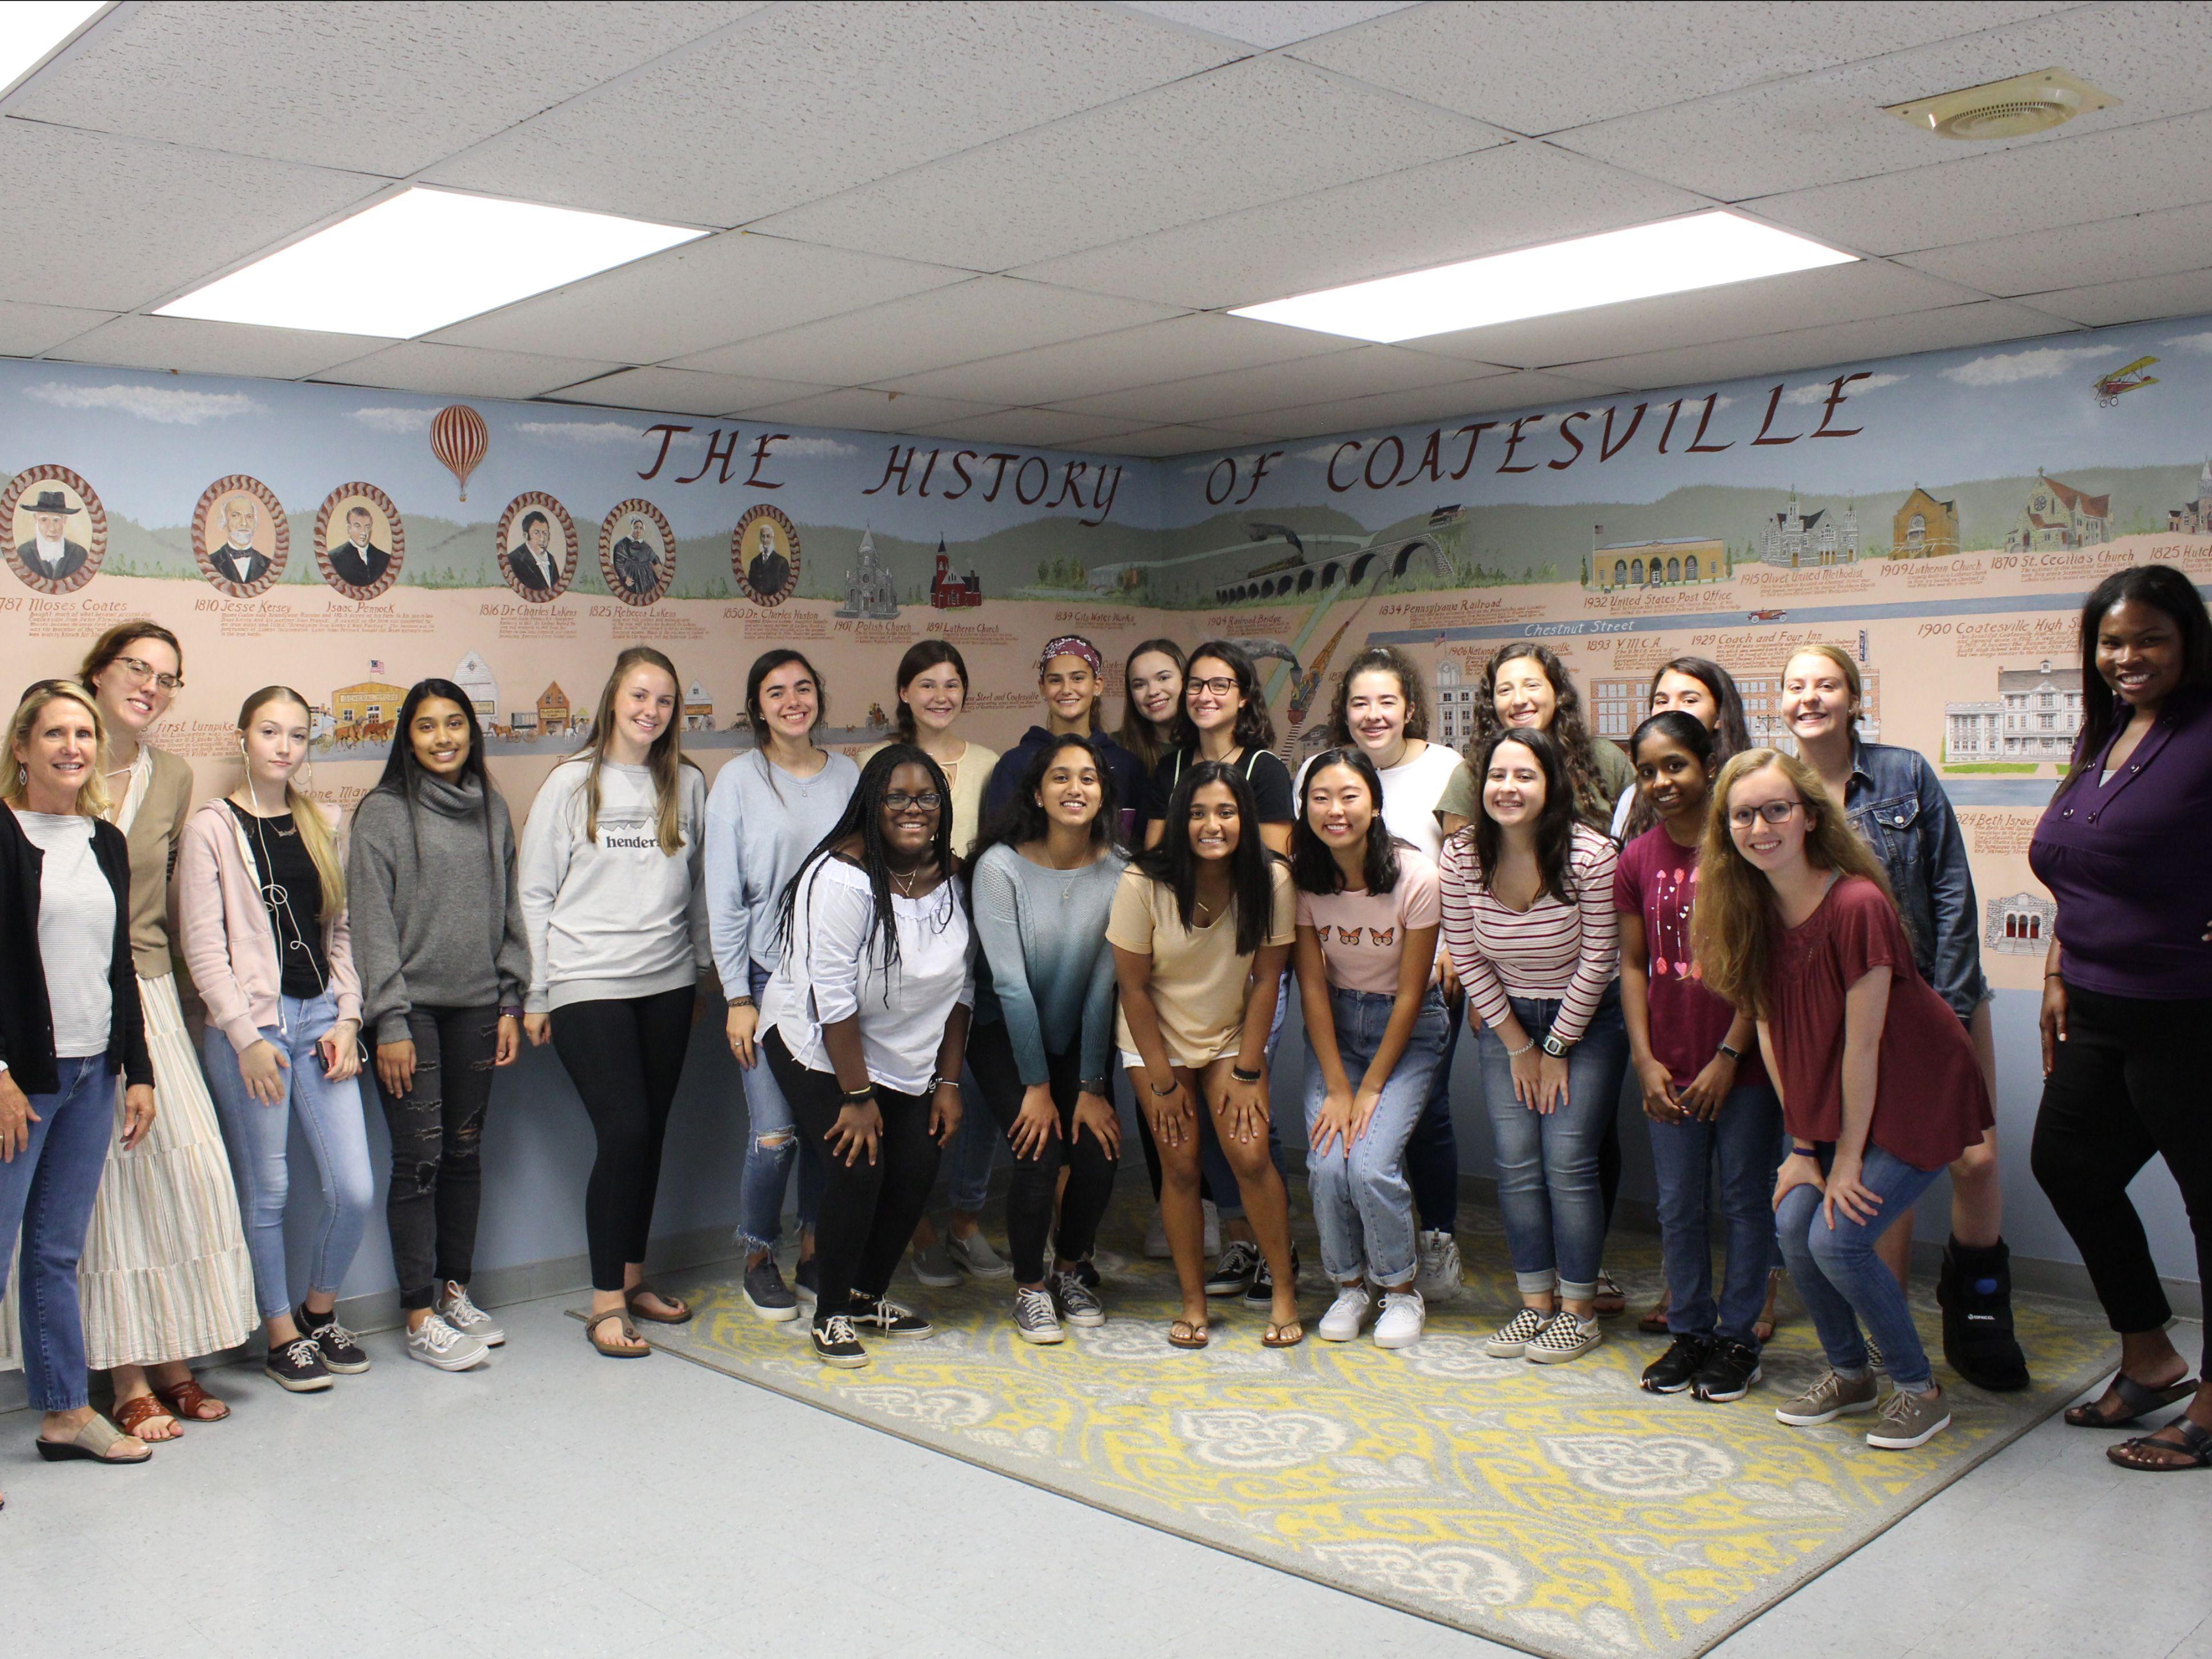 CCFWG Girls Advisory Board 2019-20